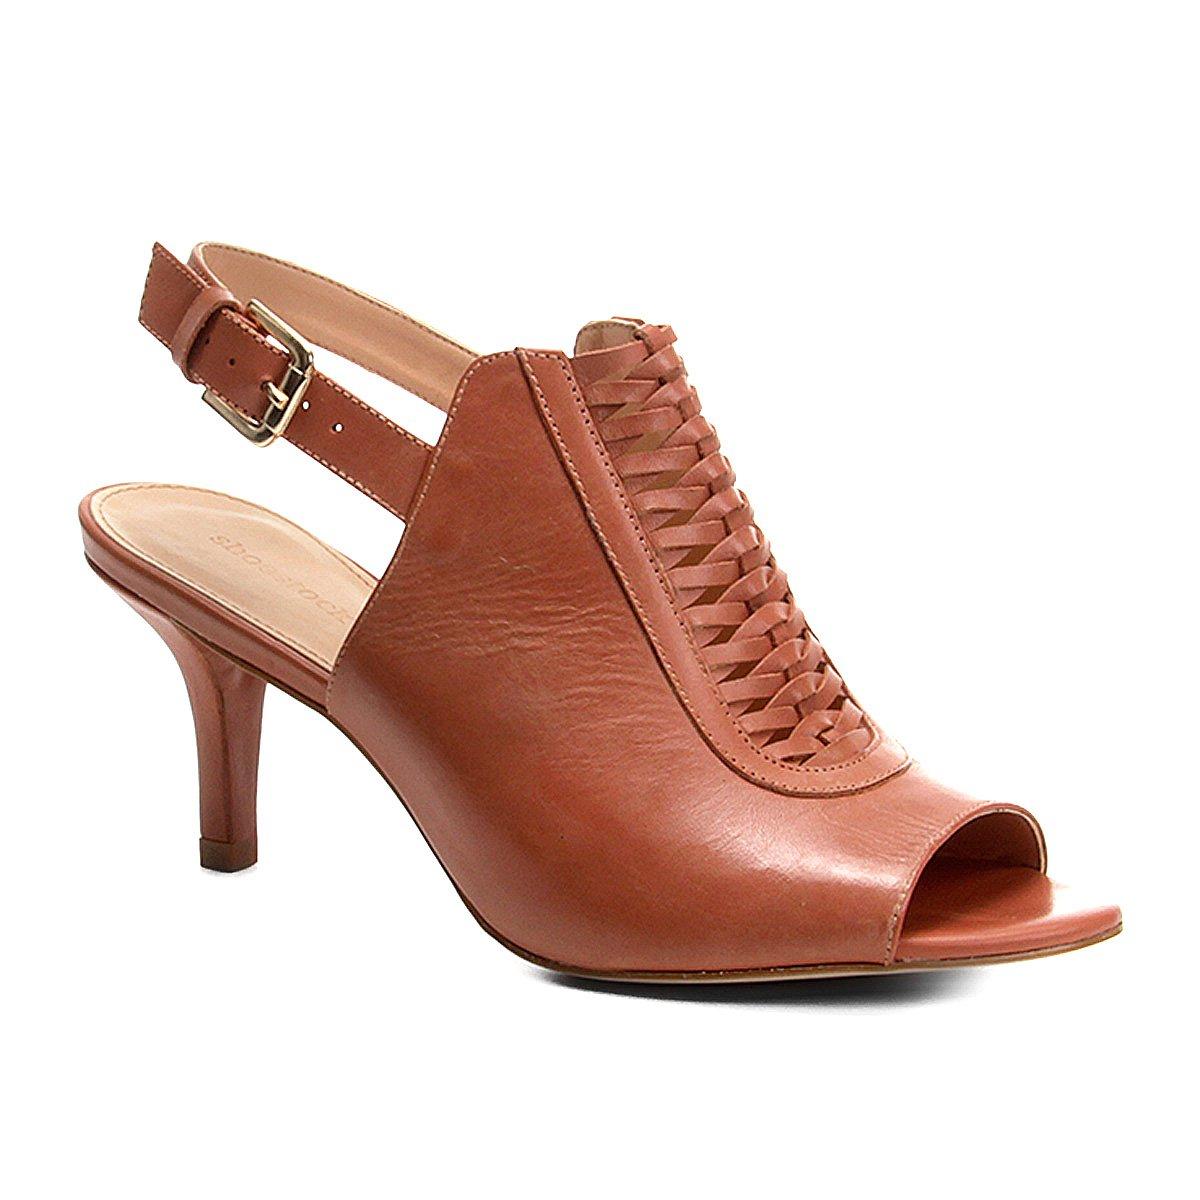 c819411a4452d Sandália Couro Shoestock Salto Fino Handmade Feminina | Shoestock